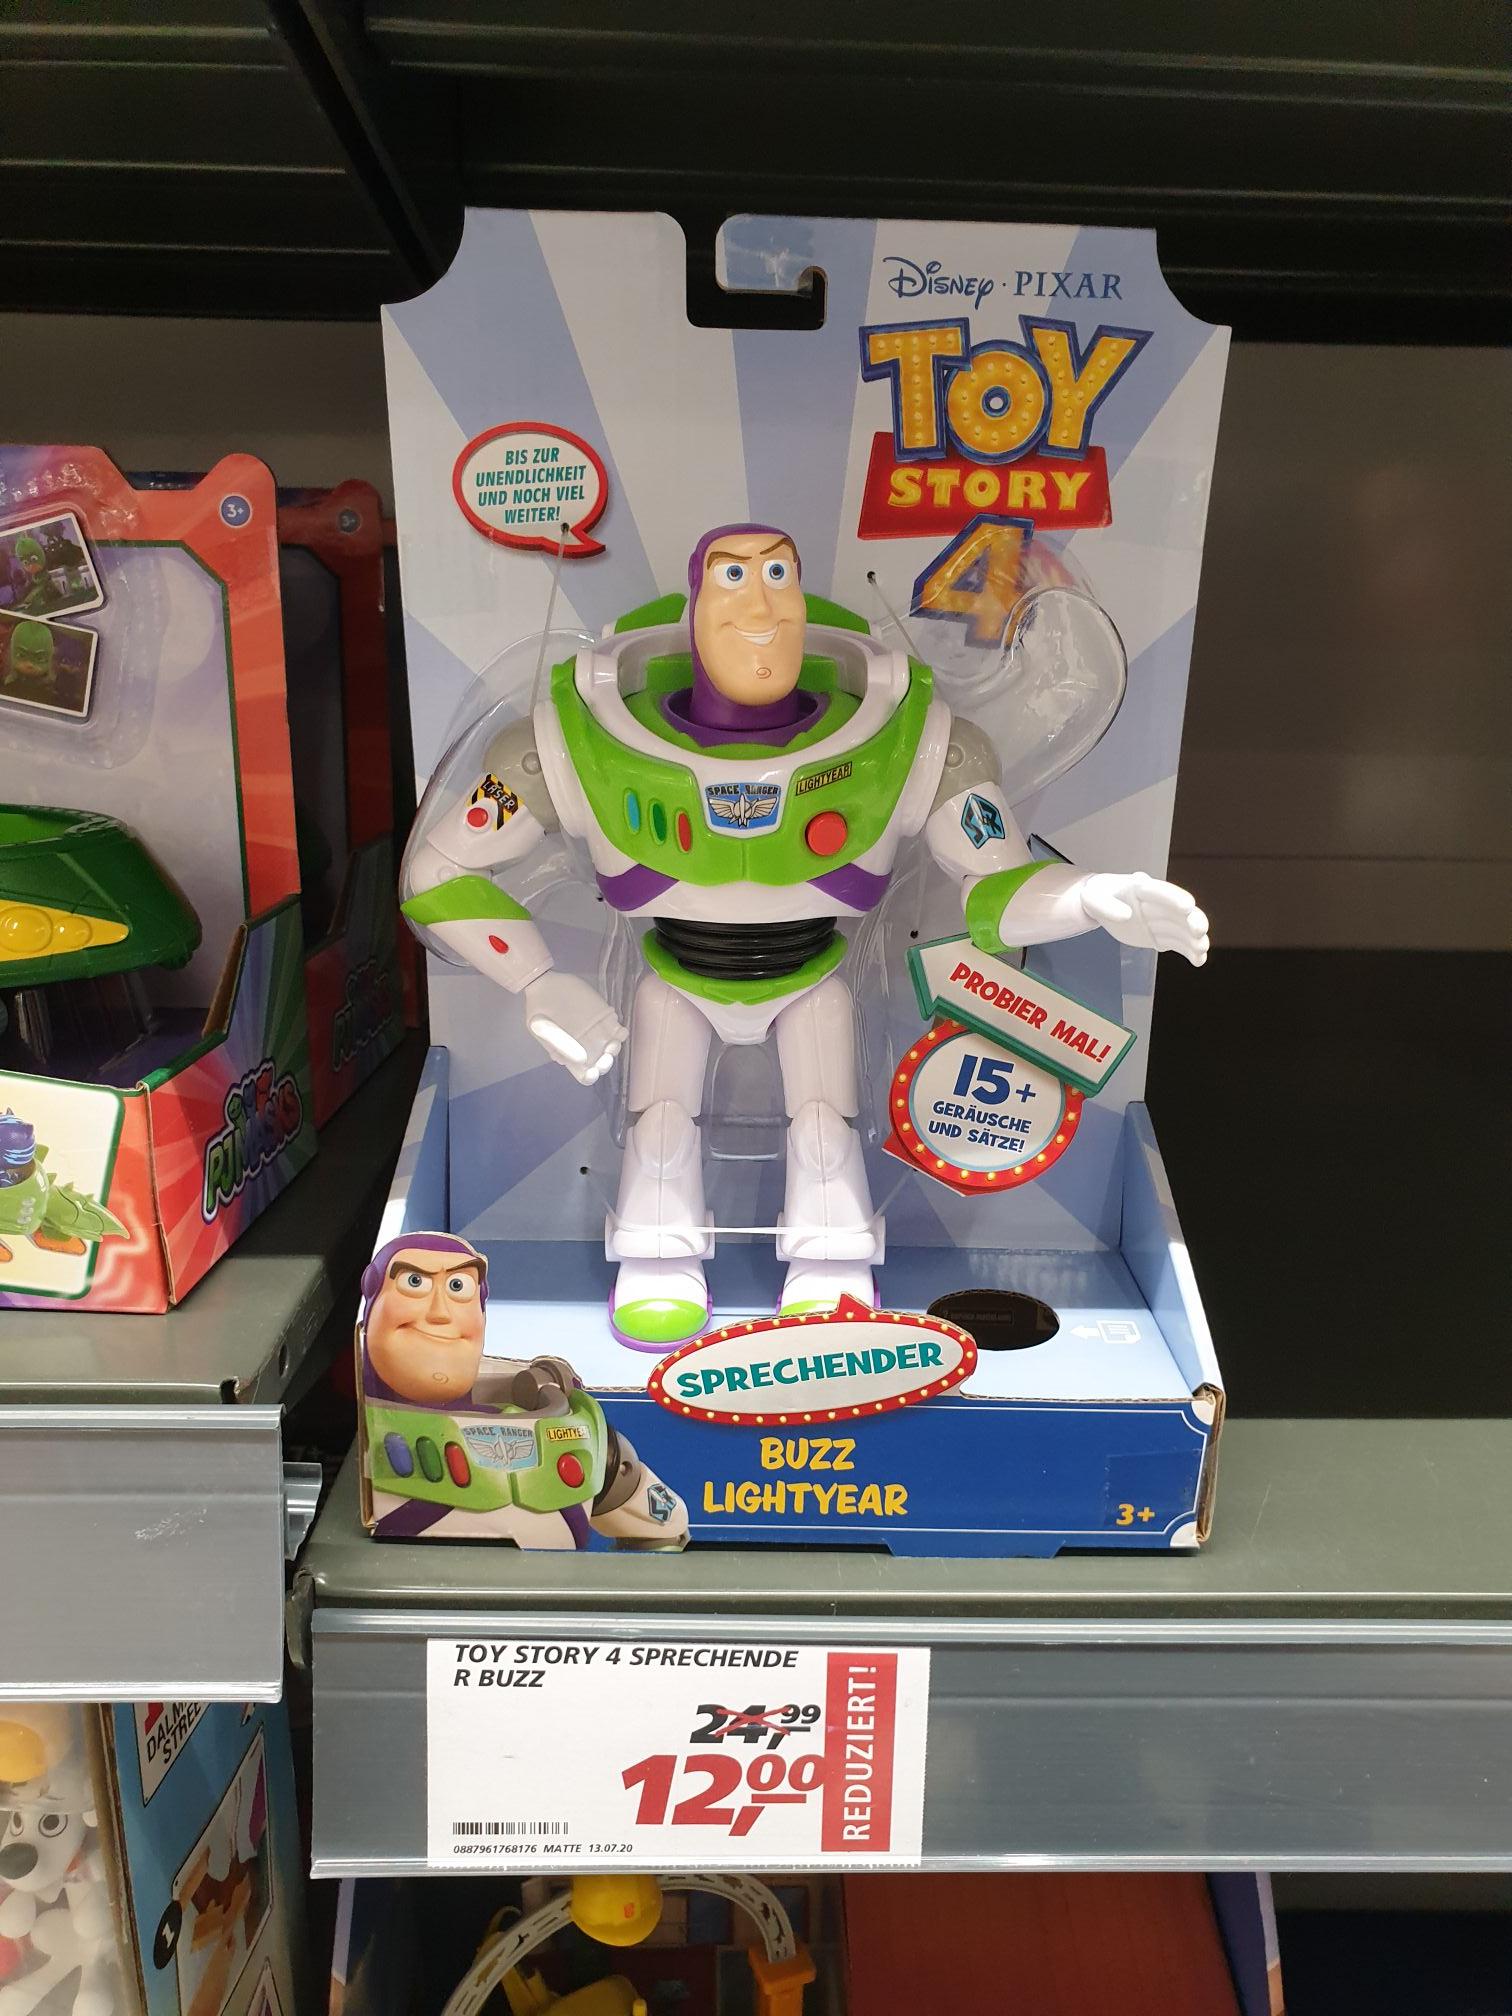 Lokal Sankt Augustin NRW REAL Sprechender Buzz Lightyear Toy Story Disney